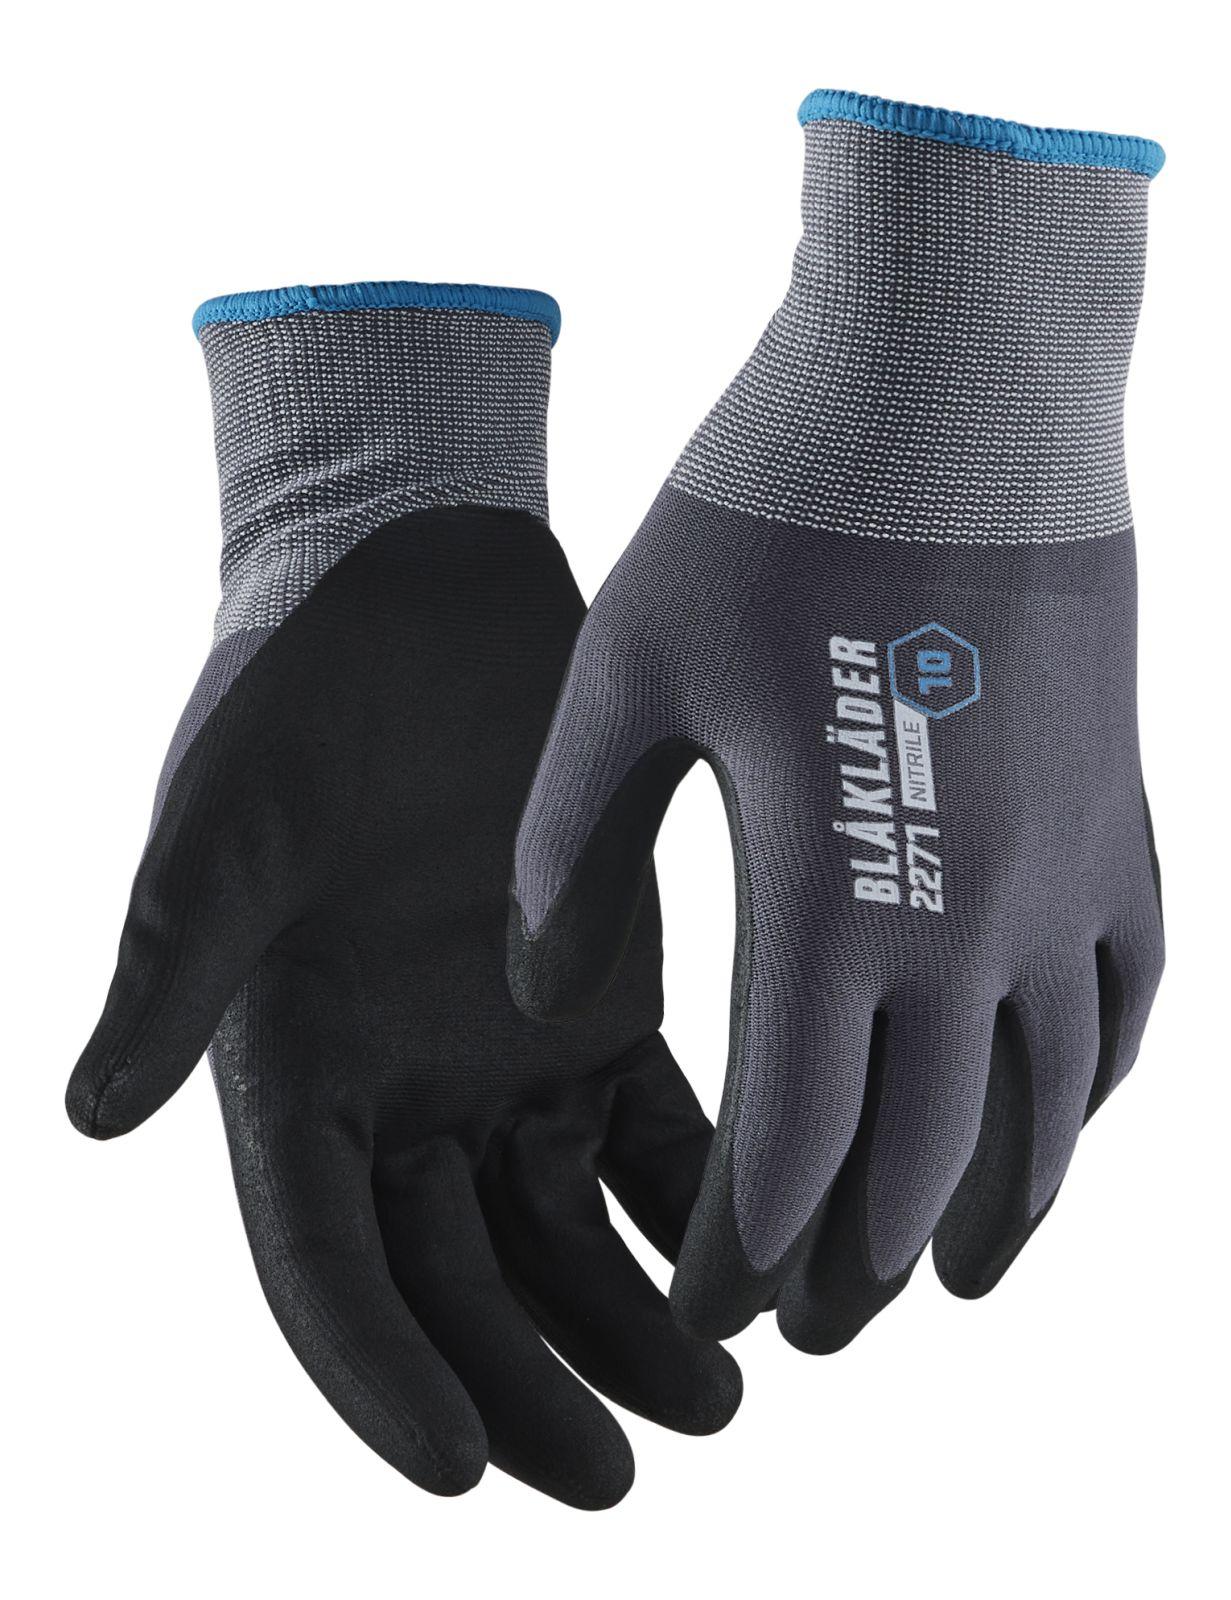 Blaklader Werkhandschoenen 22711049 grijs-zwart(6002)